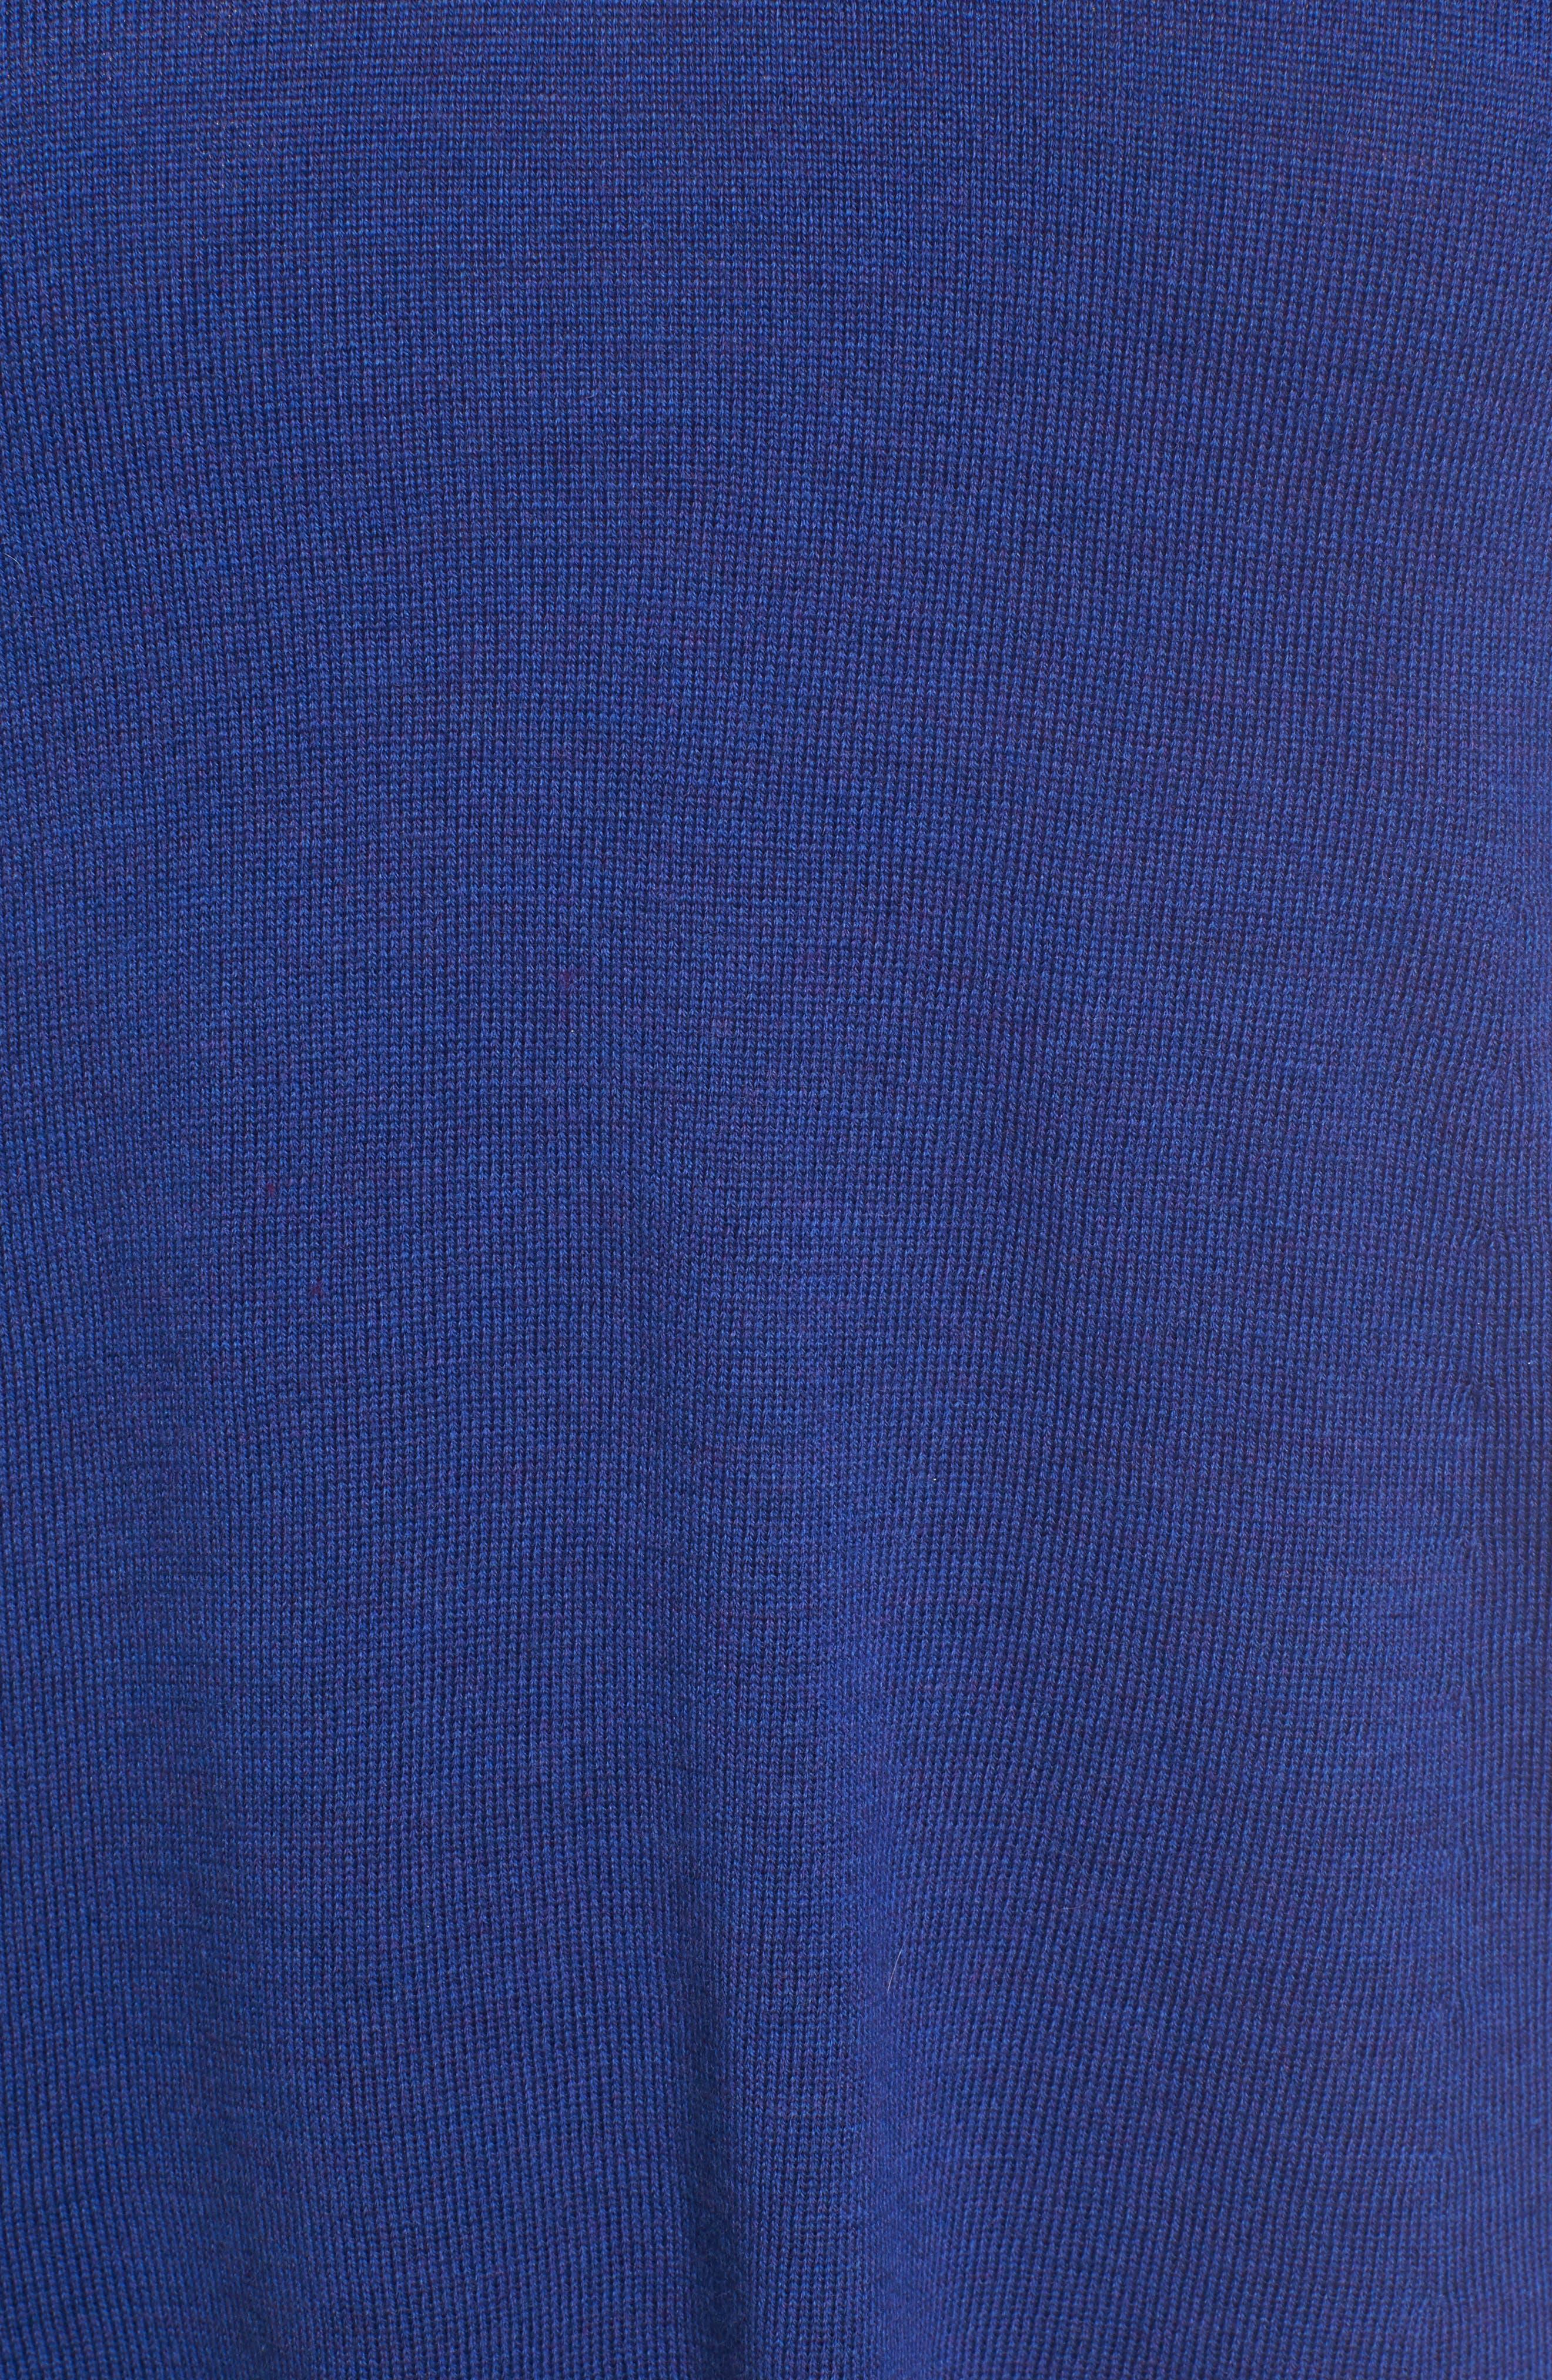 Lightweight Merino Jersey V-Neck Tunic,                             Alternate thumbnail 43, color,